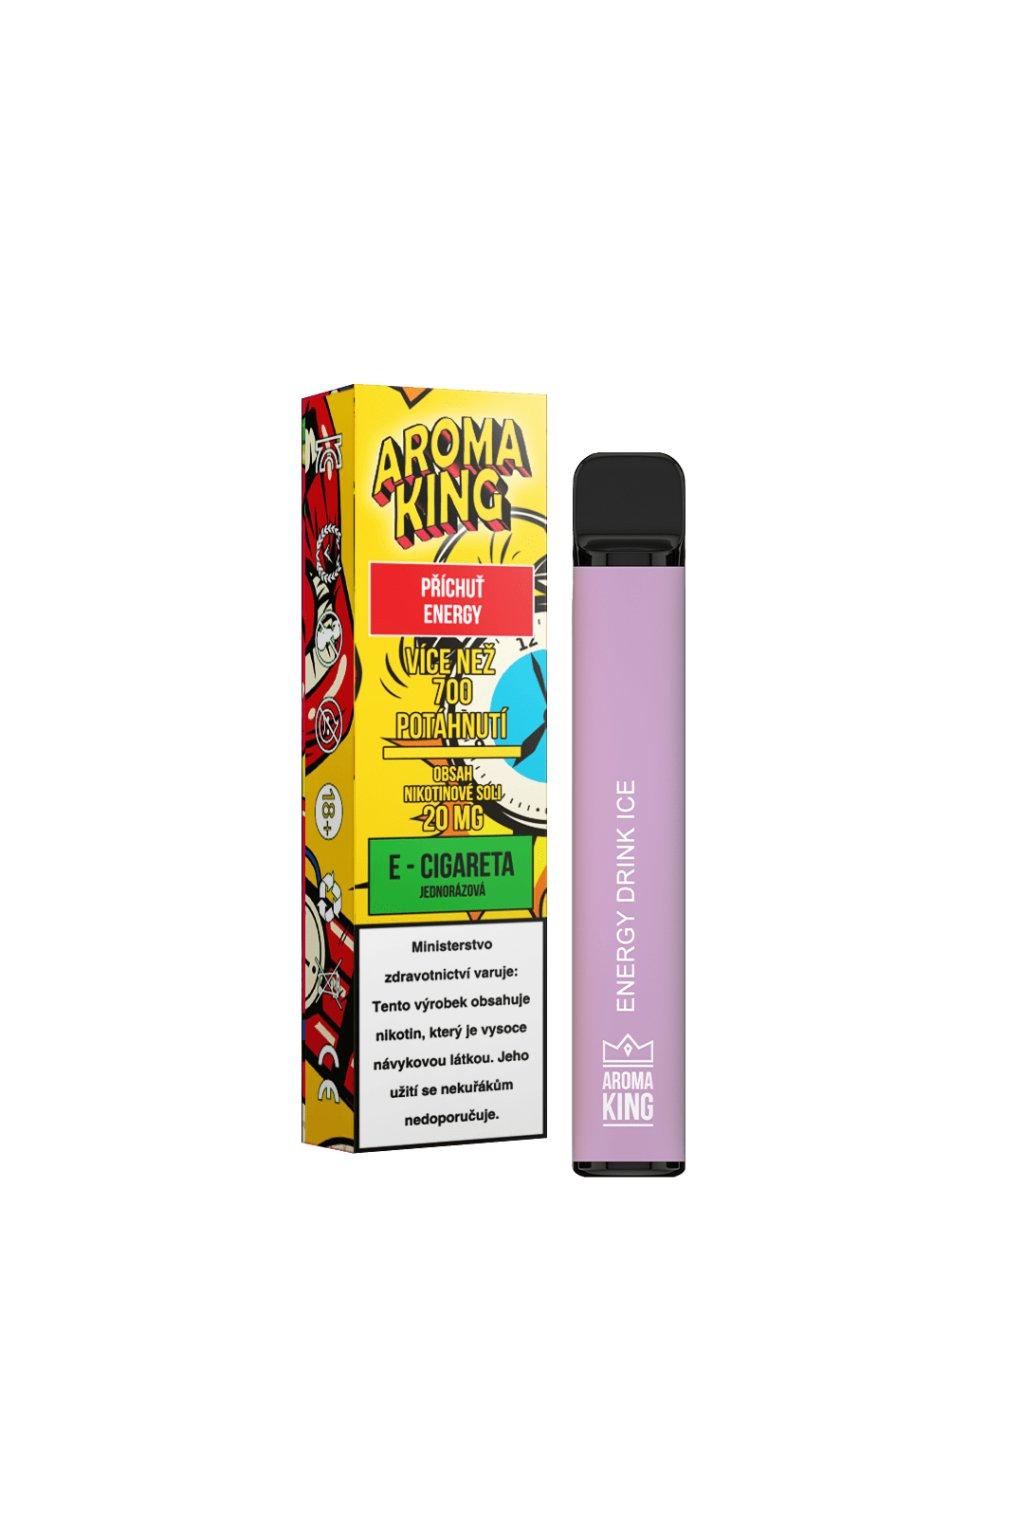 Aroma King jednorazova e cigareta energy drink cosmic 700 potahnuti min